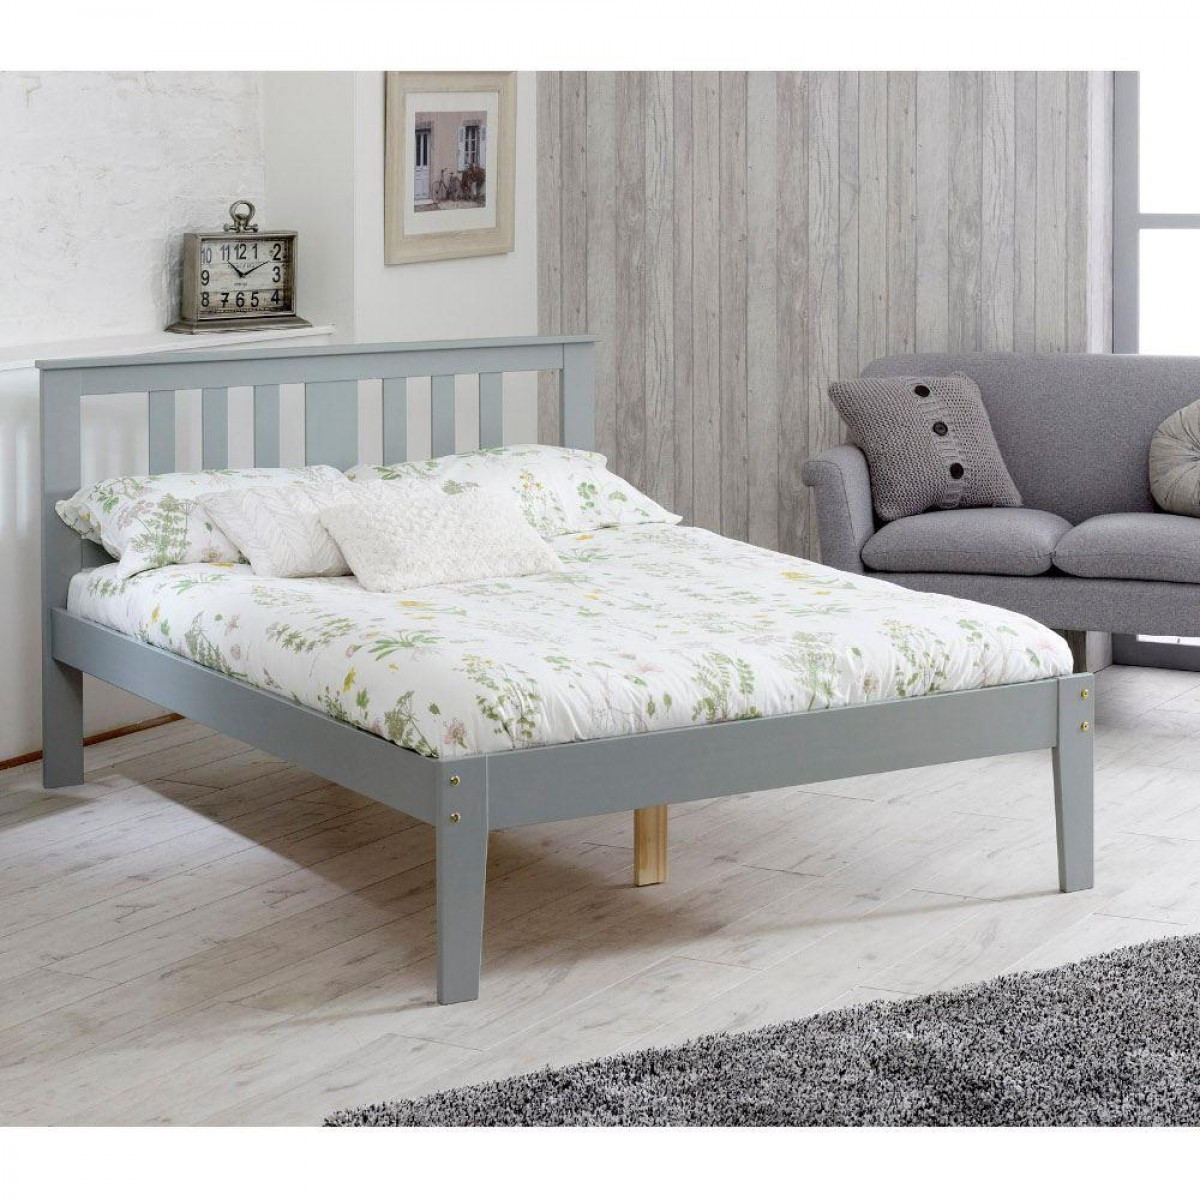 Kingston Grey Wooden Bed